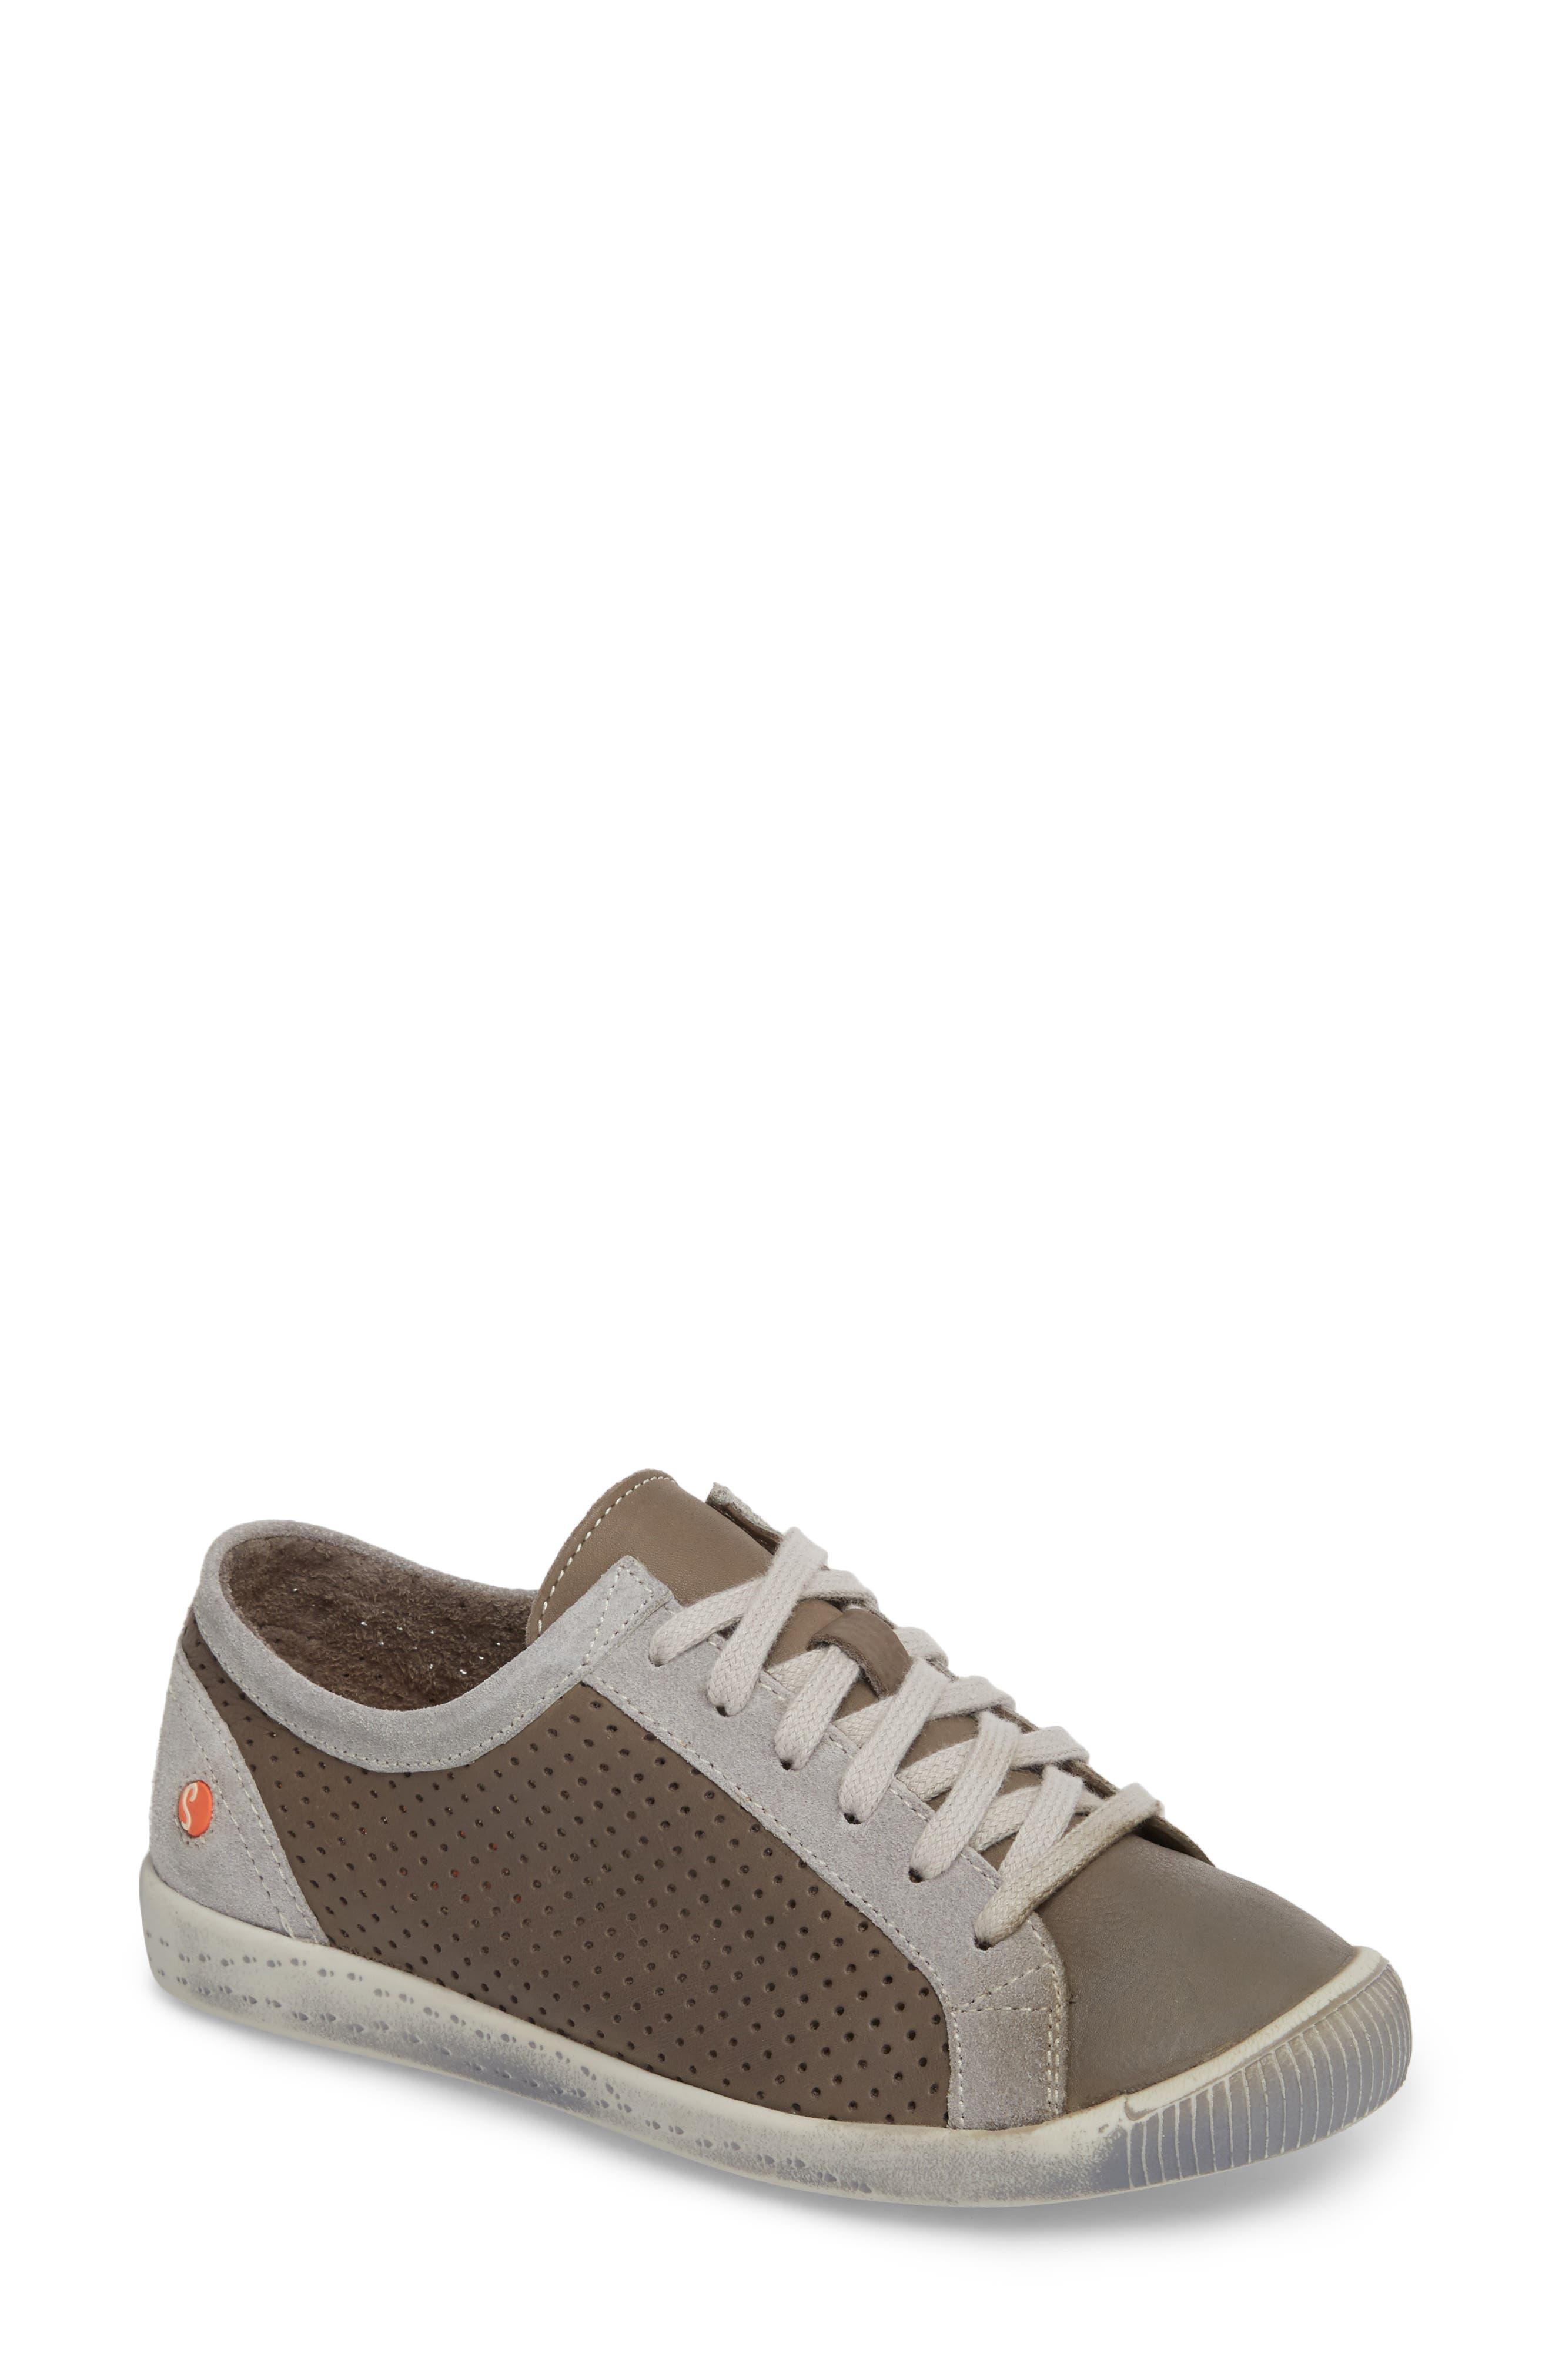 Ica Sneaker,                             Main thumbnail 2, color,